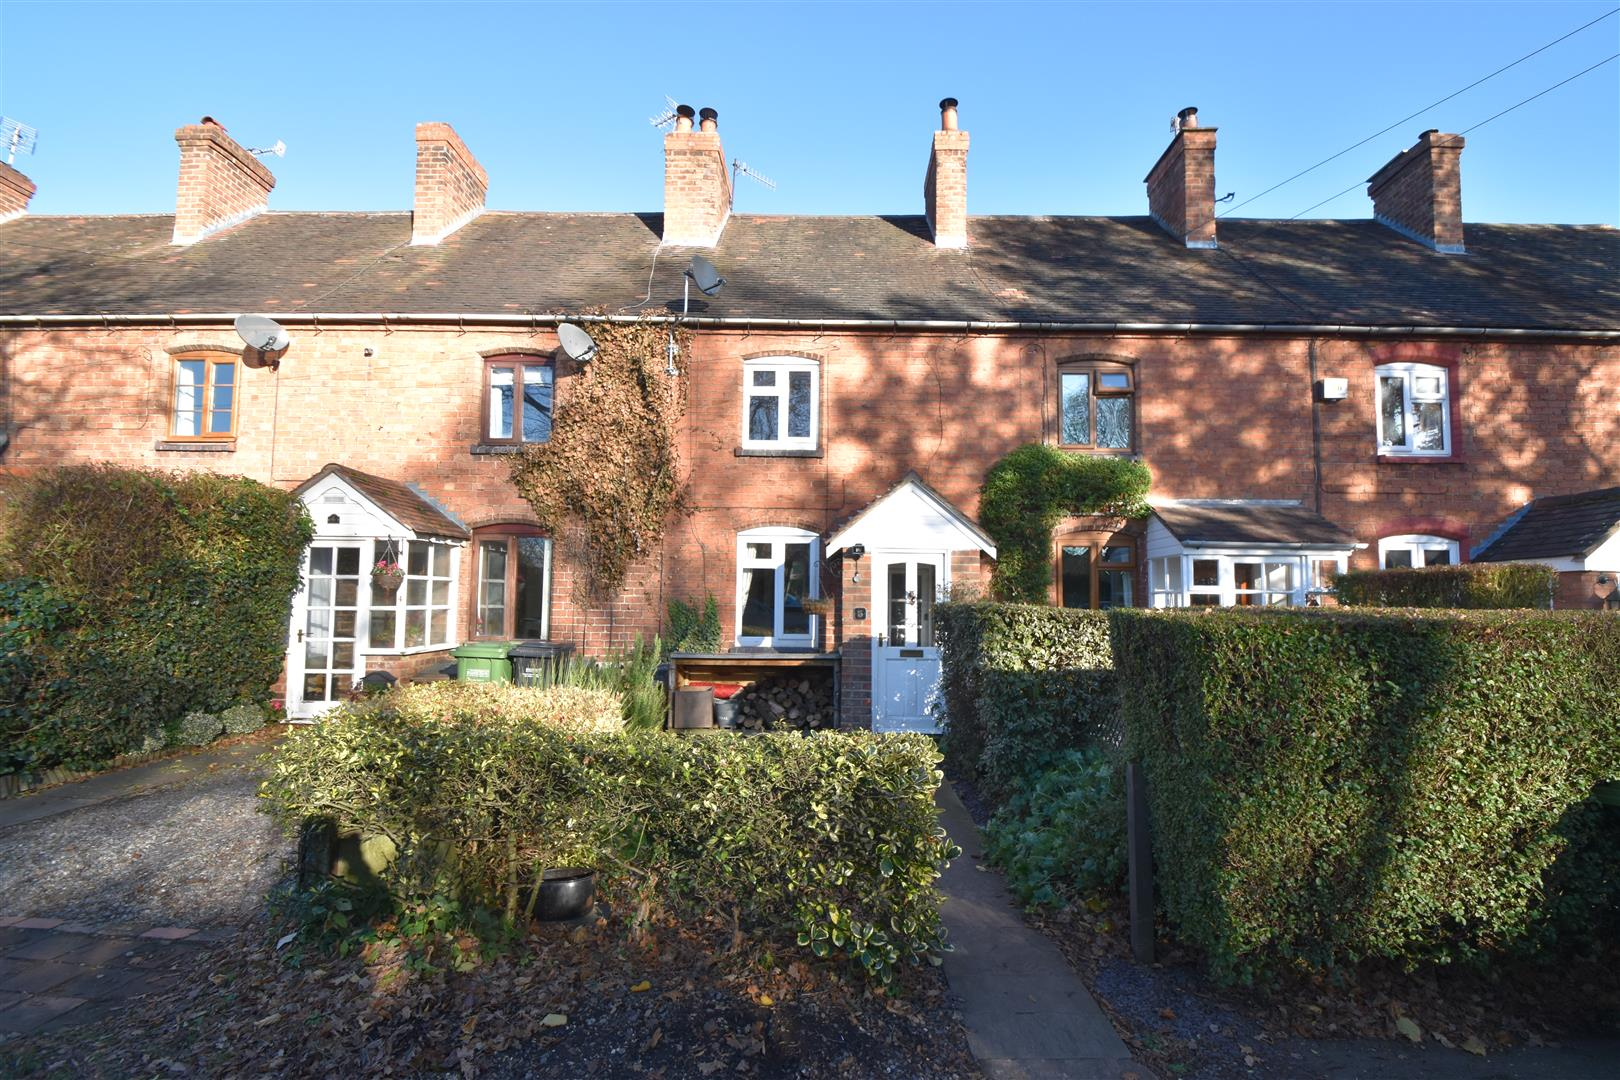 3 Bedrooms Terraced House for sale in Walton Road, Hartlebury, Kidderminster